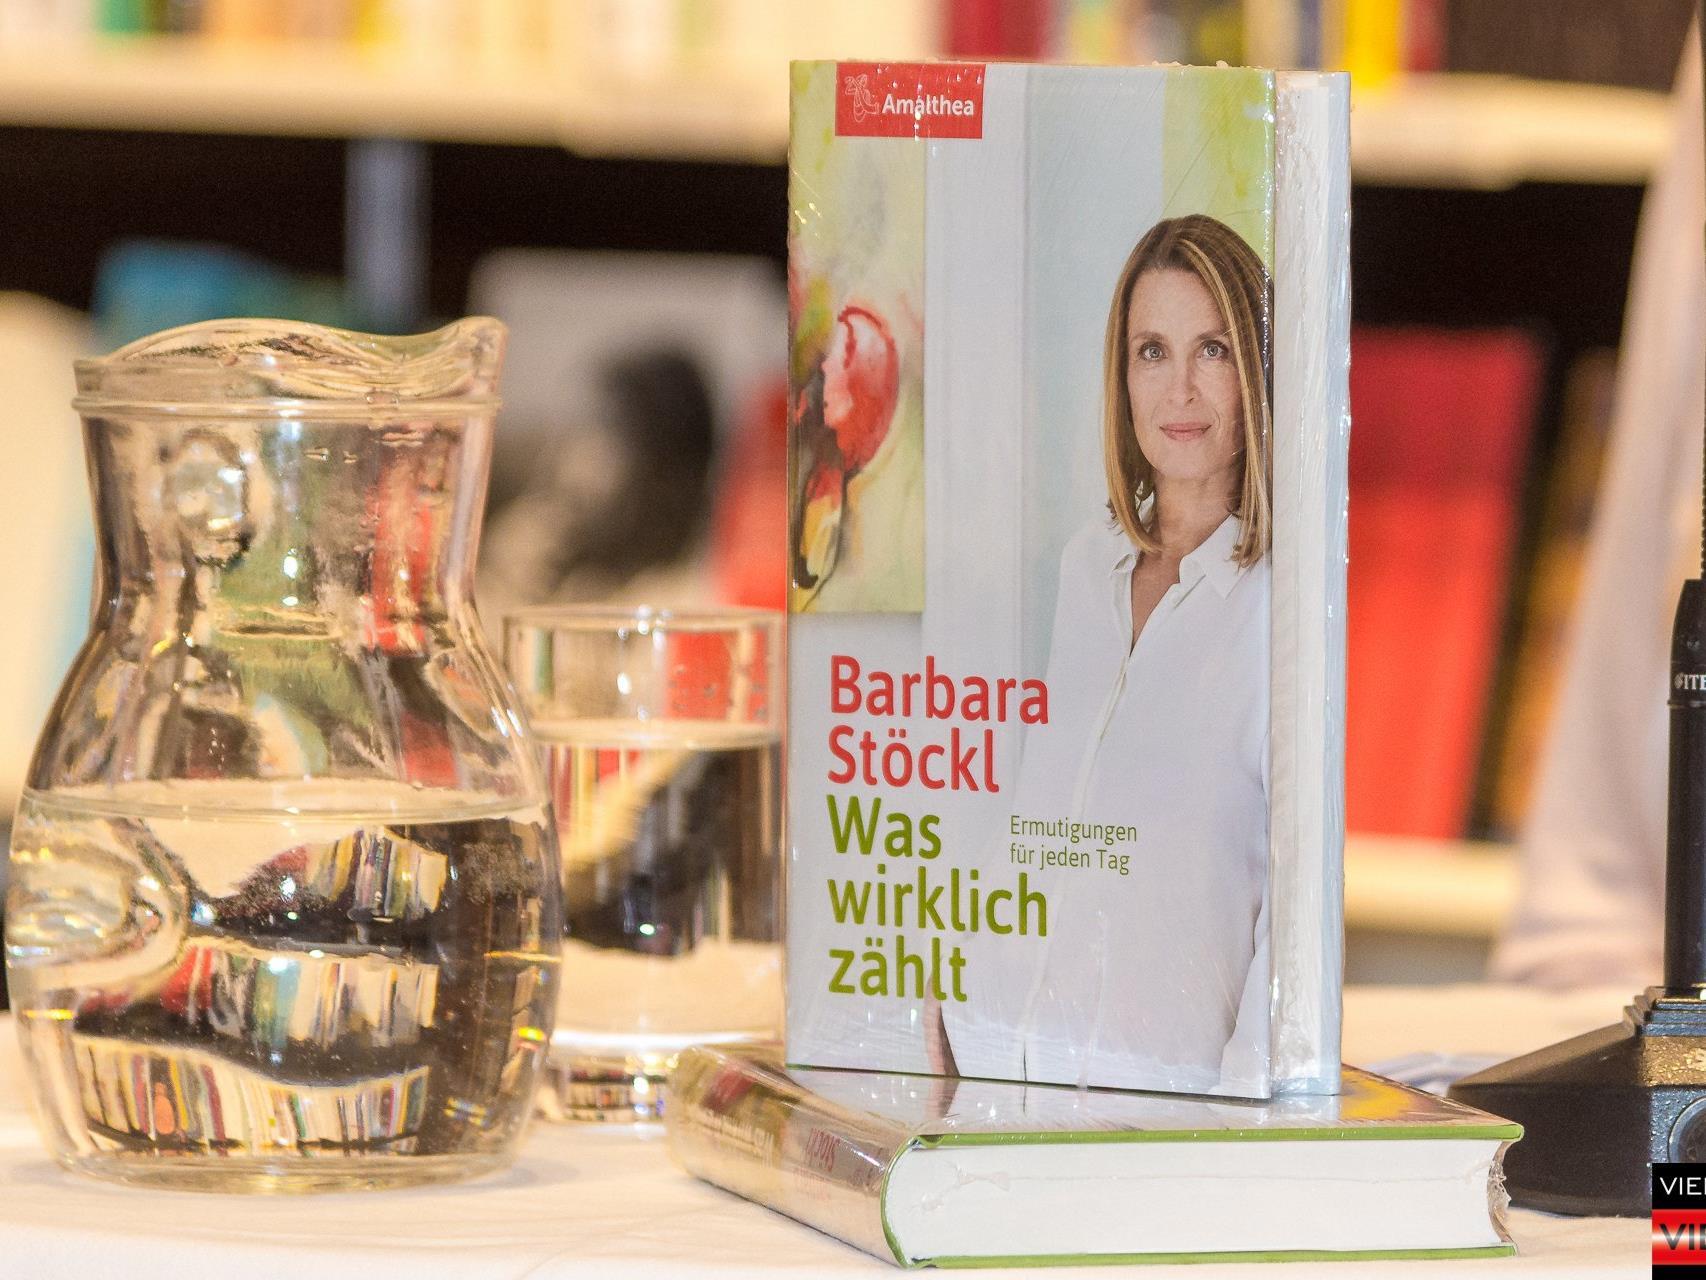 Barbara Stöckl - Was wirklich zählt - Lesung - Dombuchhandlung am Stephansplatz - 11.04.2017